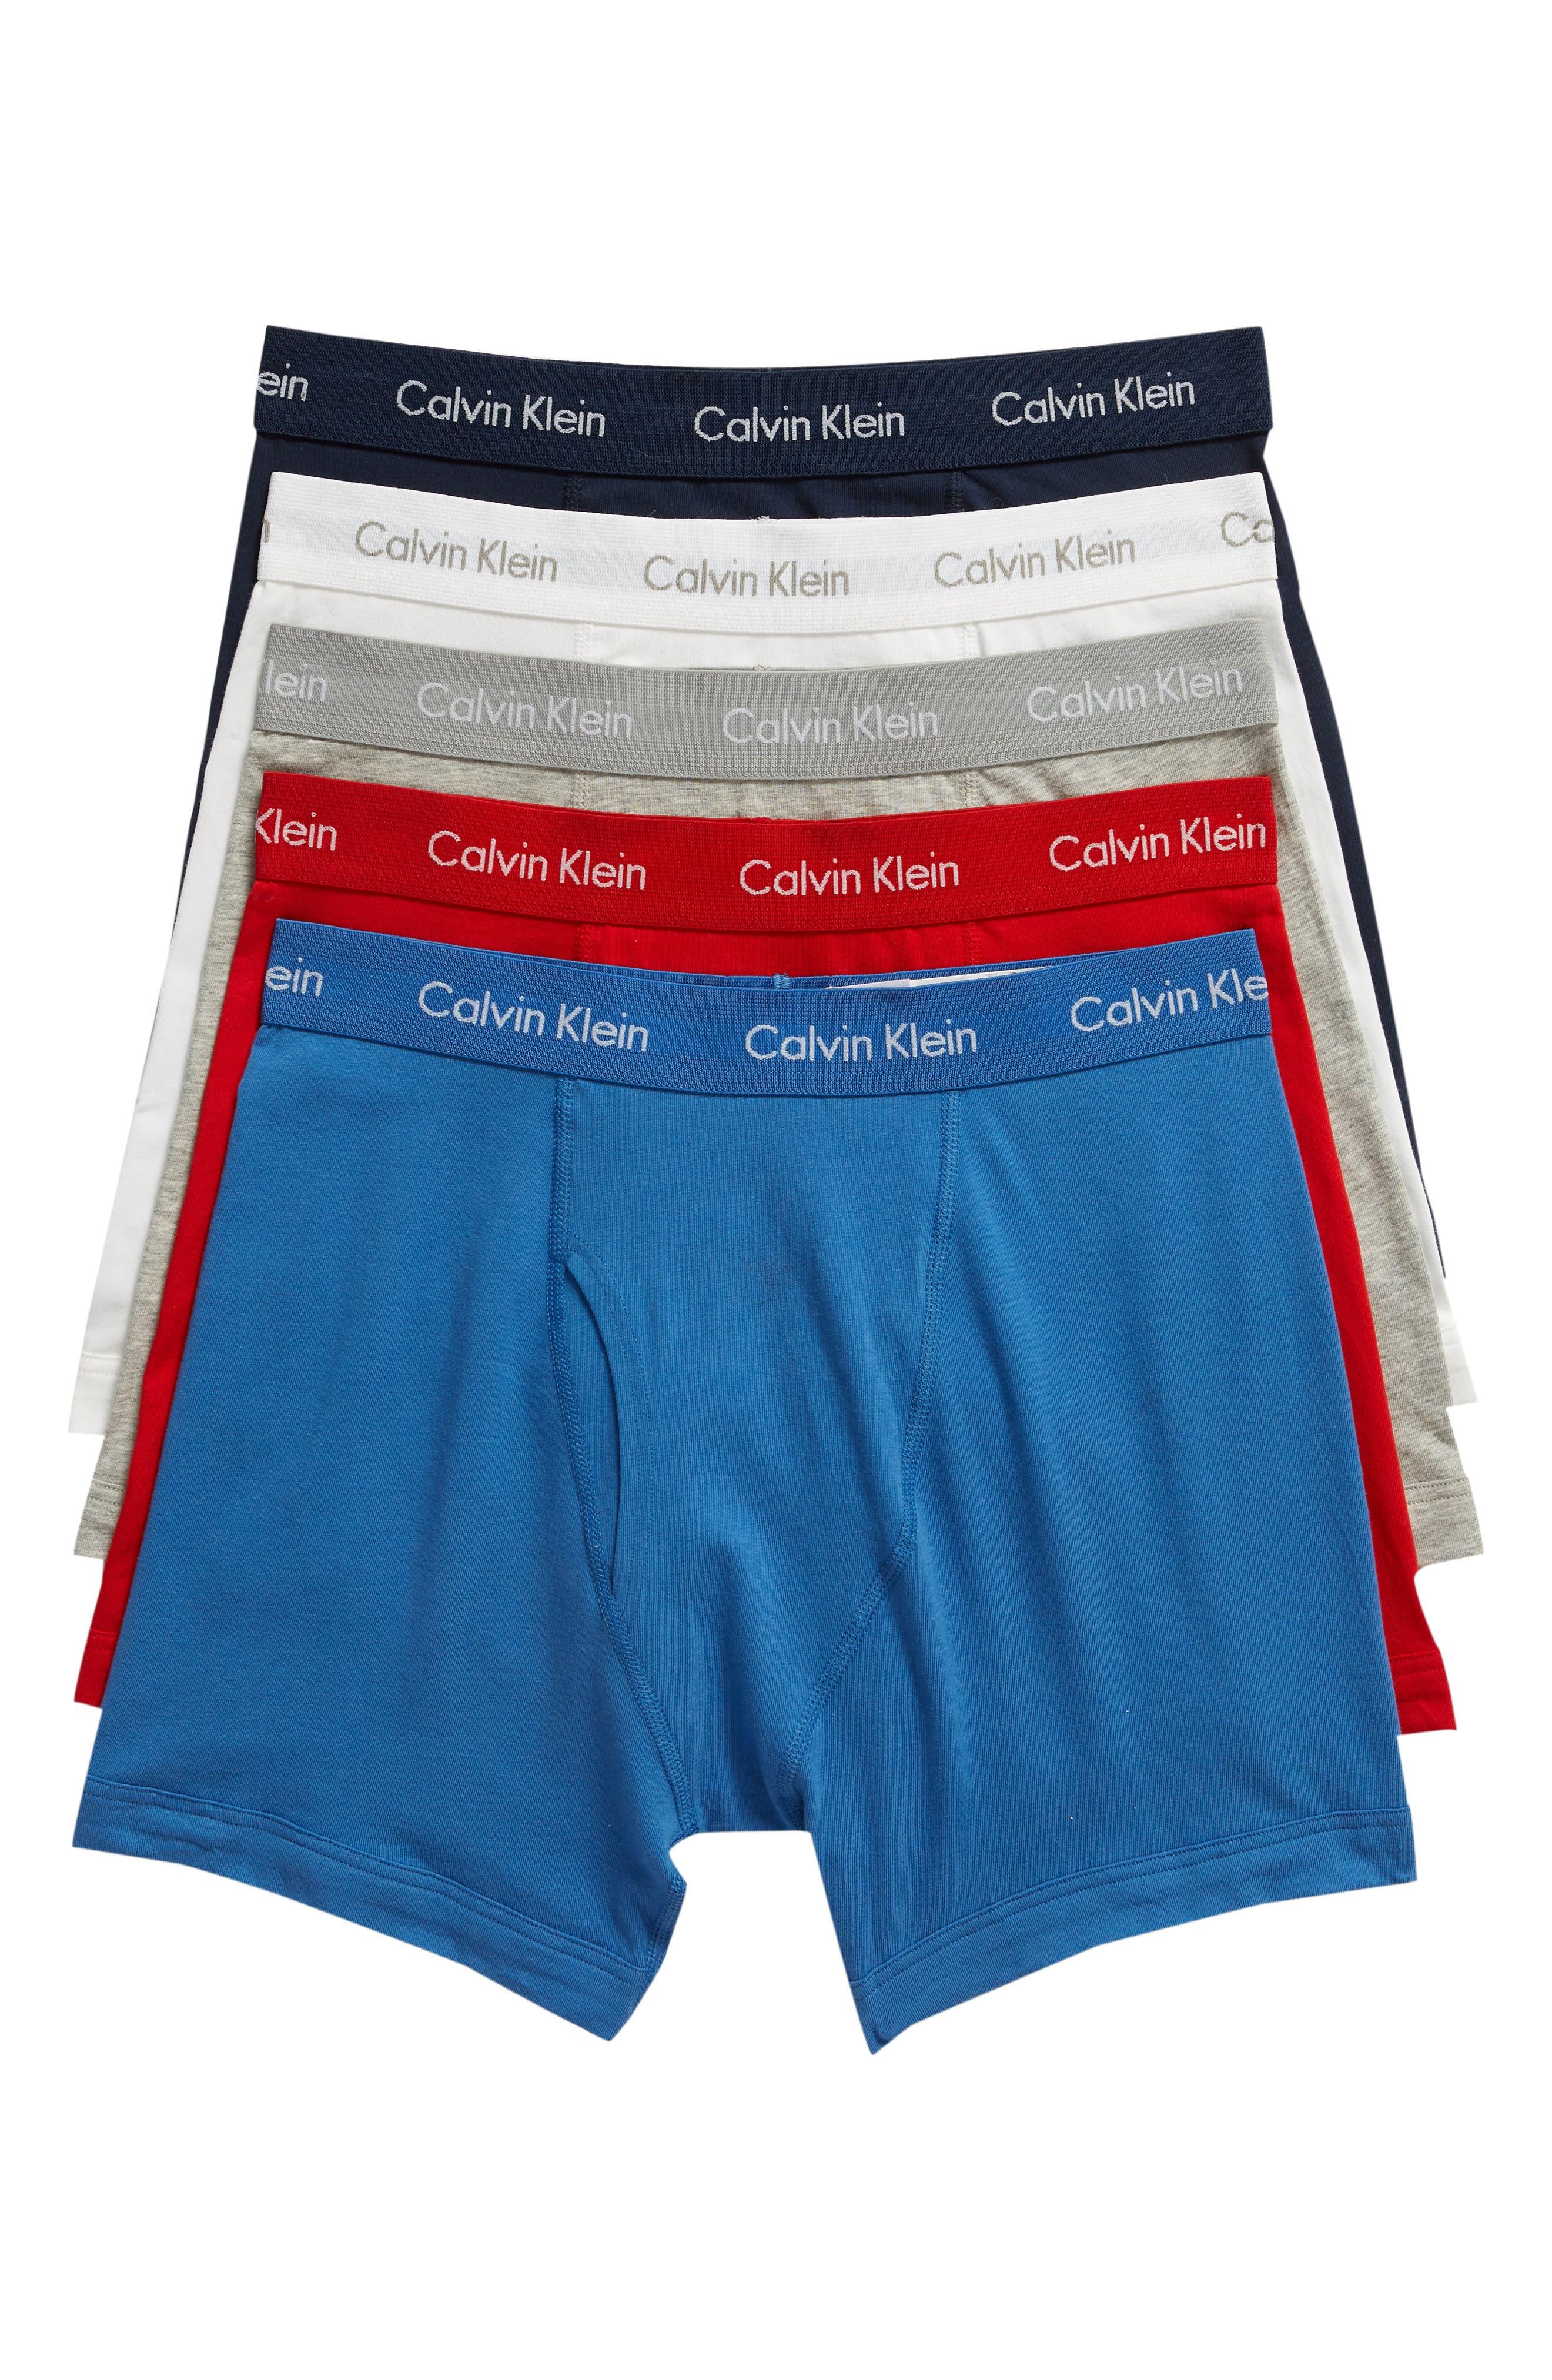 CALVIN KLEIN 5-Pack Boxer Briefs, Main, color, 403